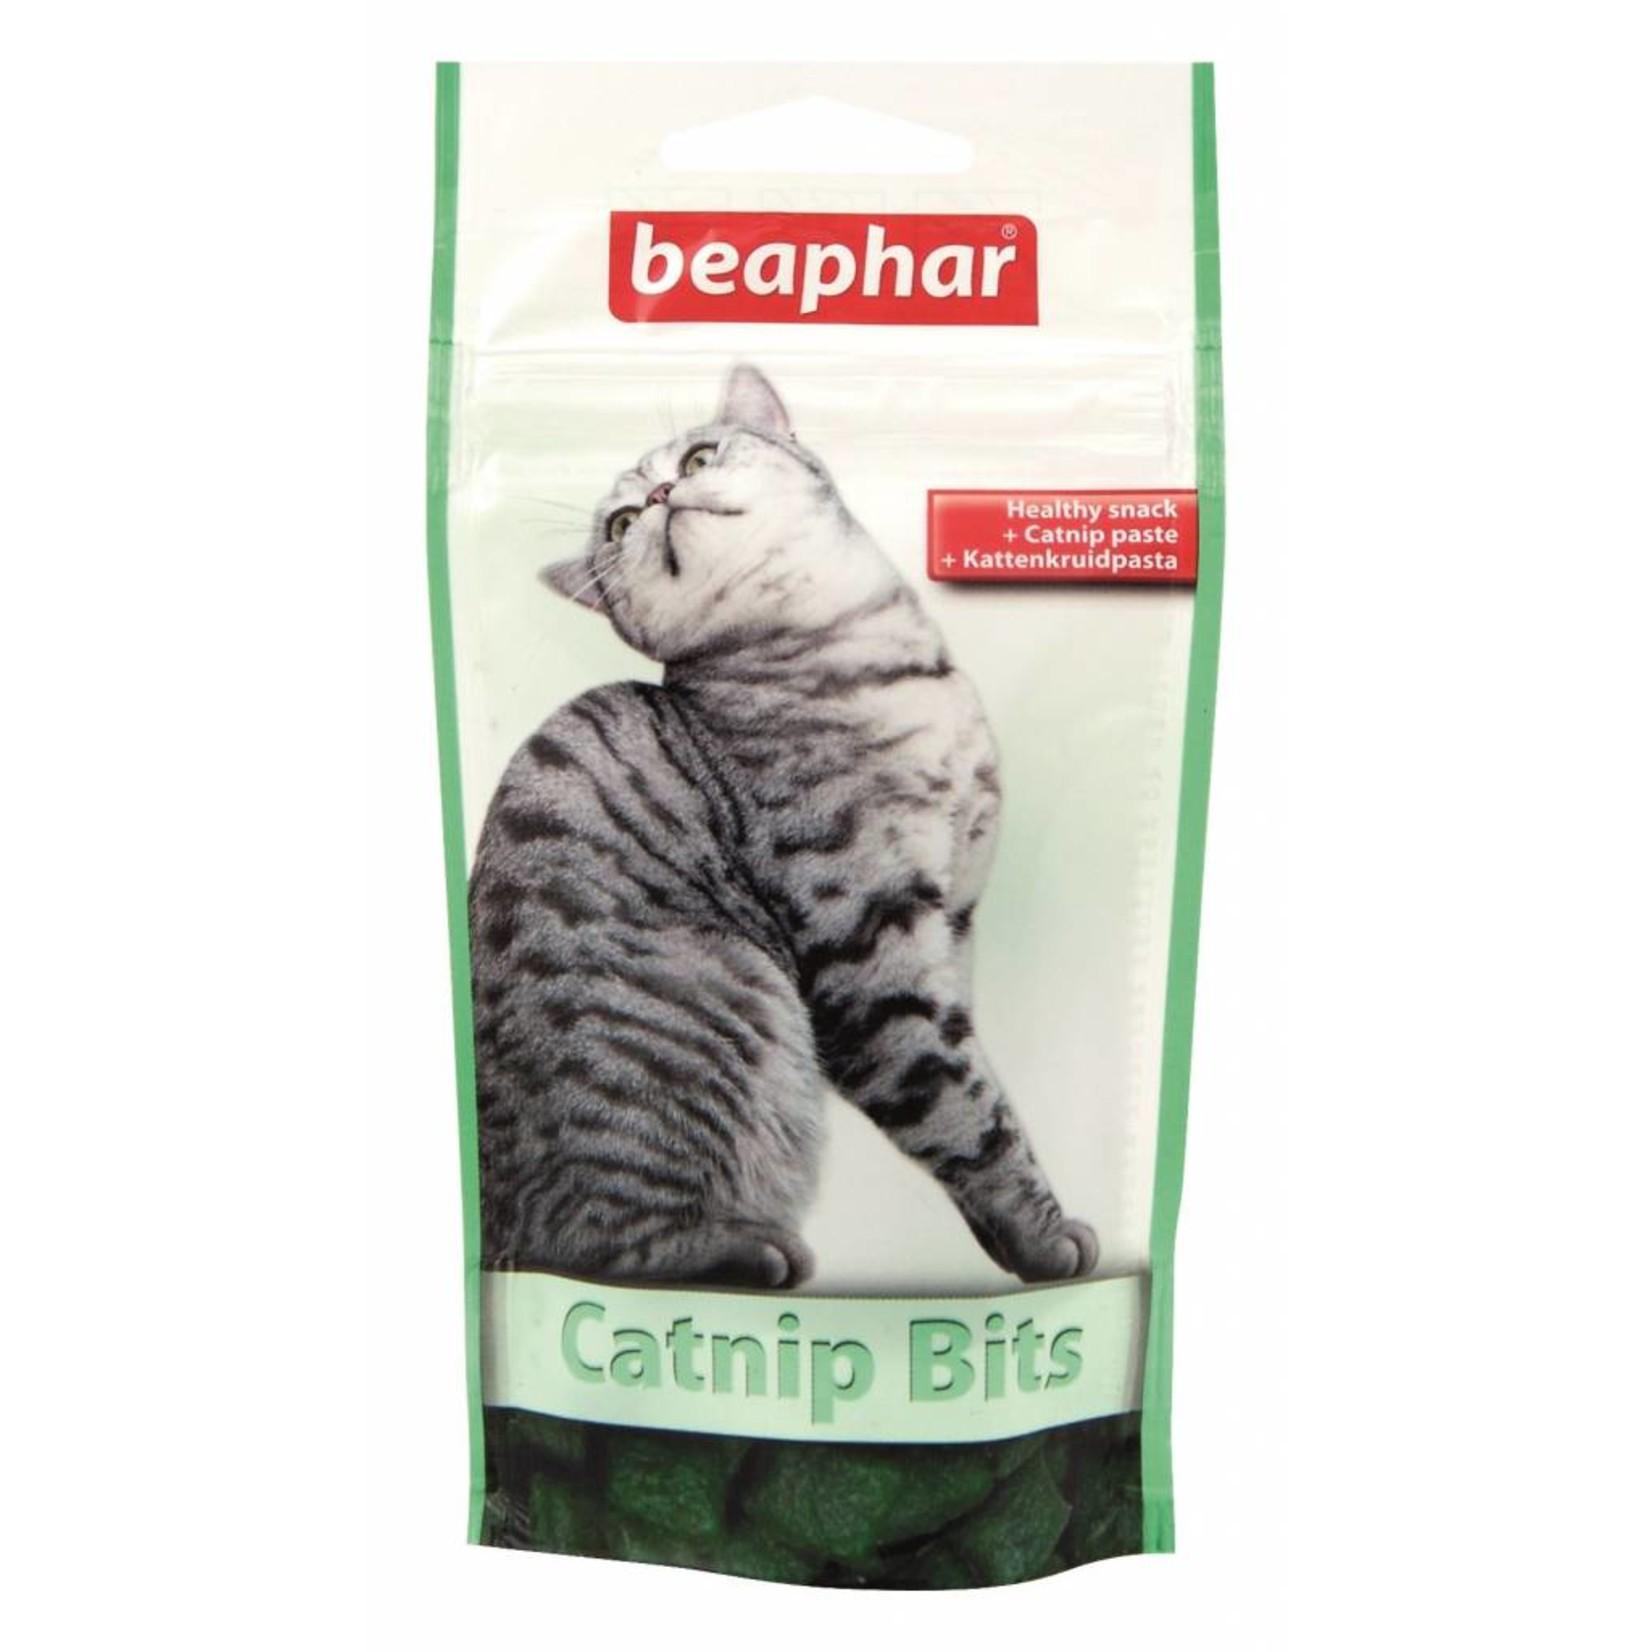 Beaphar Catnip Bits Cat Treats, 35g